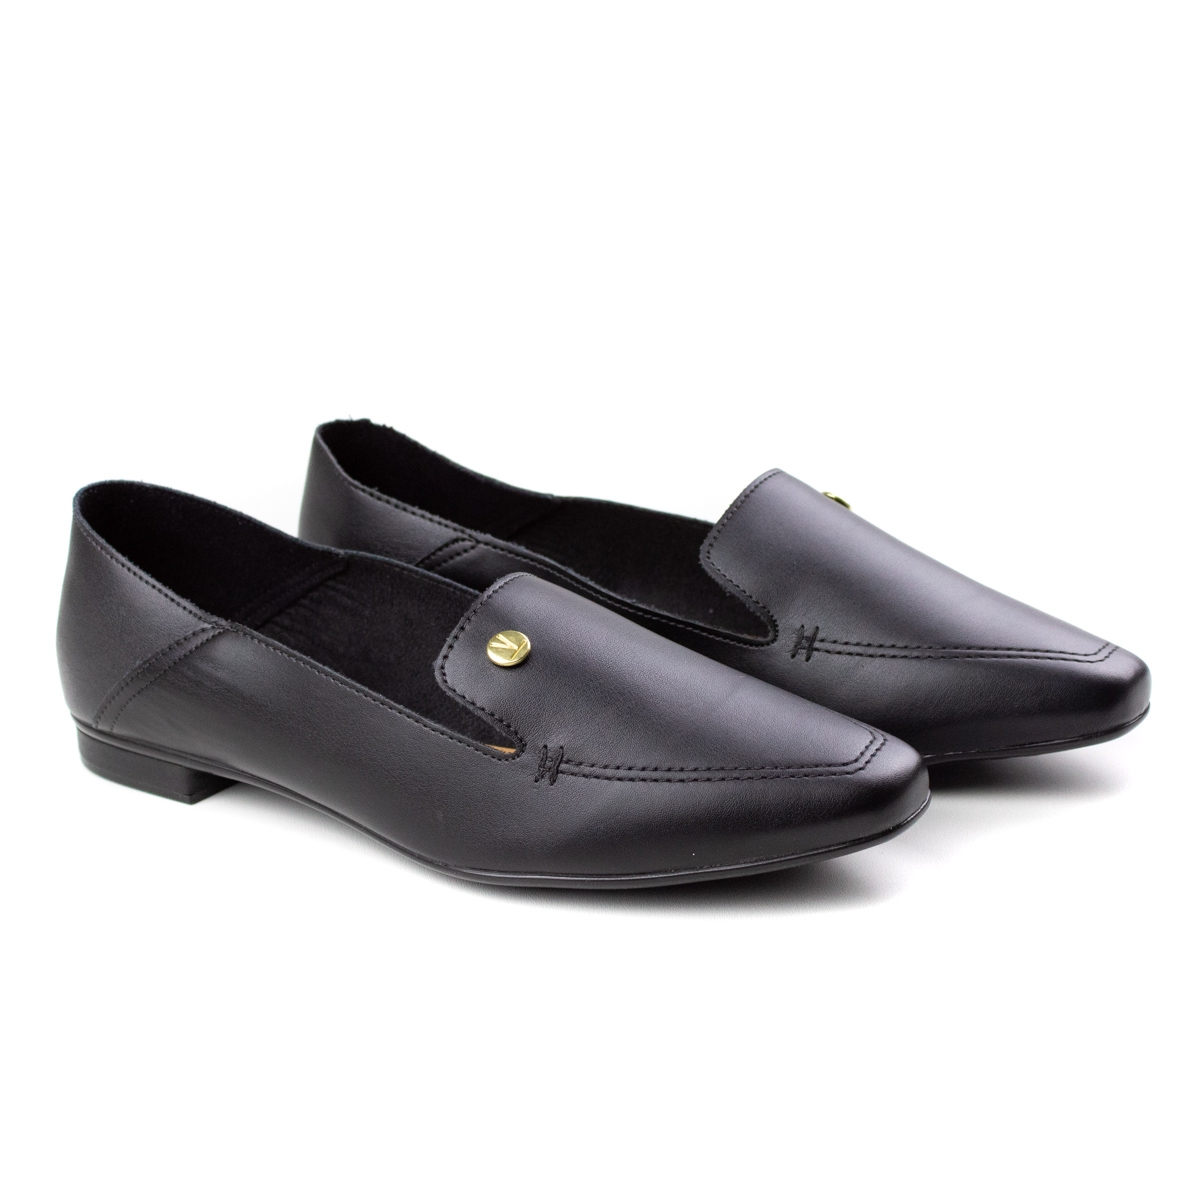 Sapato Rasteiro Feminino Vizzano - Preto